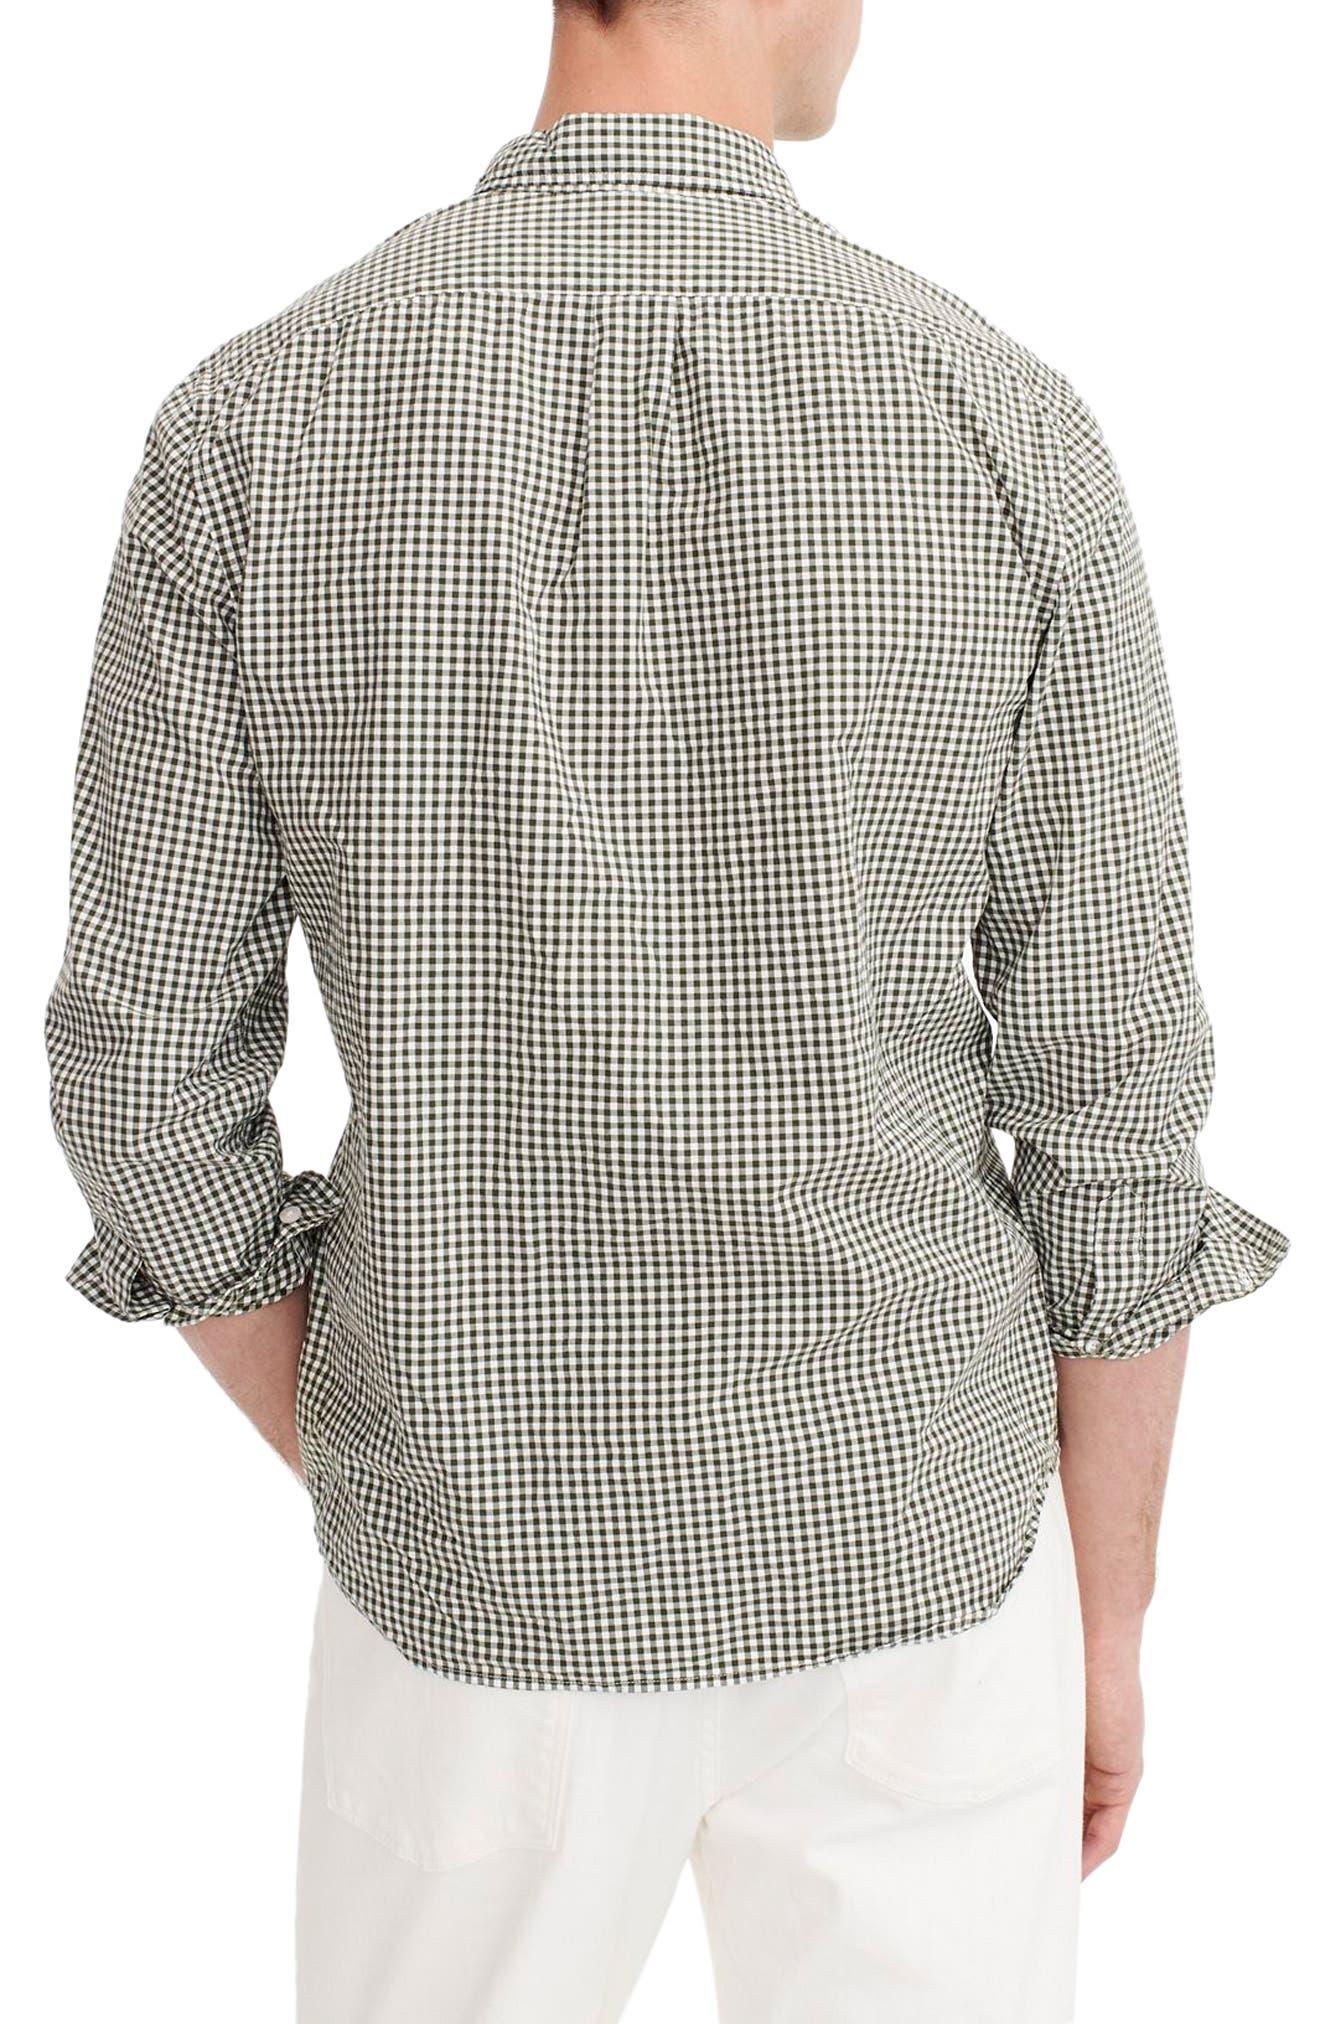 J.CREW,                             Slim Fit Stretch Secret Wash Gingham Sport Shirt,                             Main thumbnail 1, color,                             401